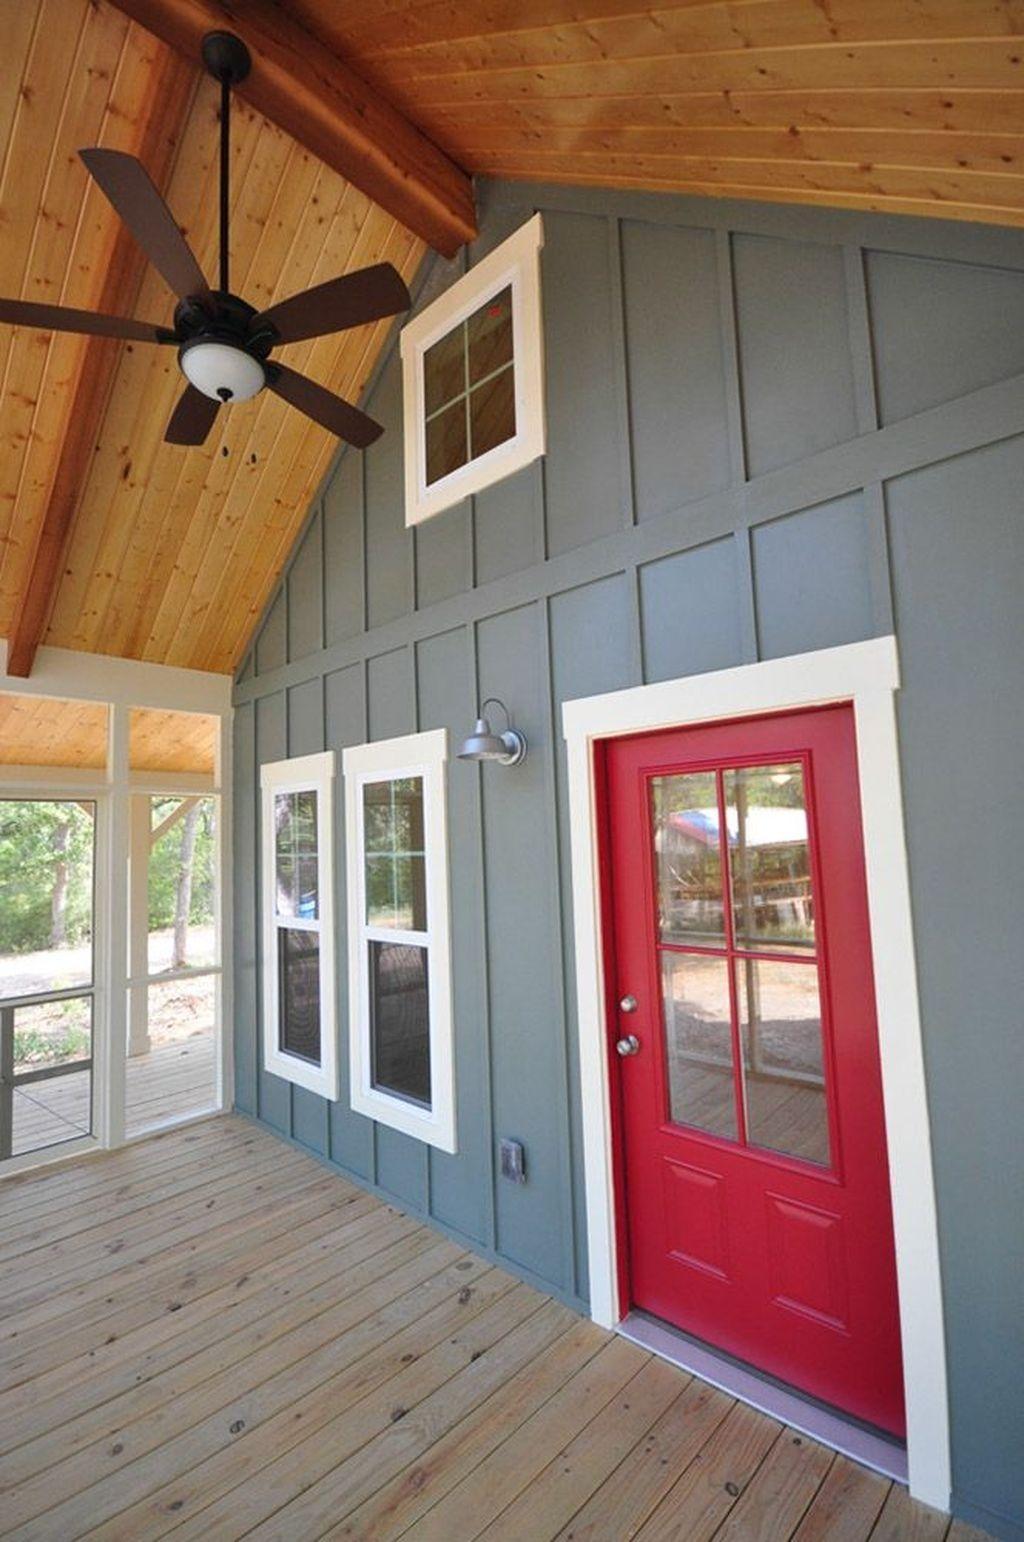 868 336 Exterior Home Design Ideas Remodel Pictures: Greatest Cottage Exterior Colors Ideas 27 Exterior #design #greatest #cottage #exterior #colors